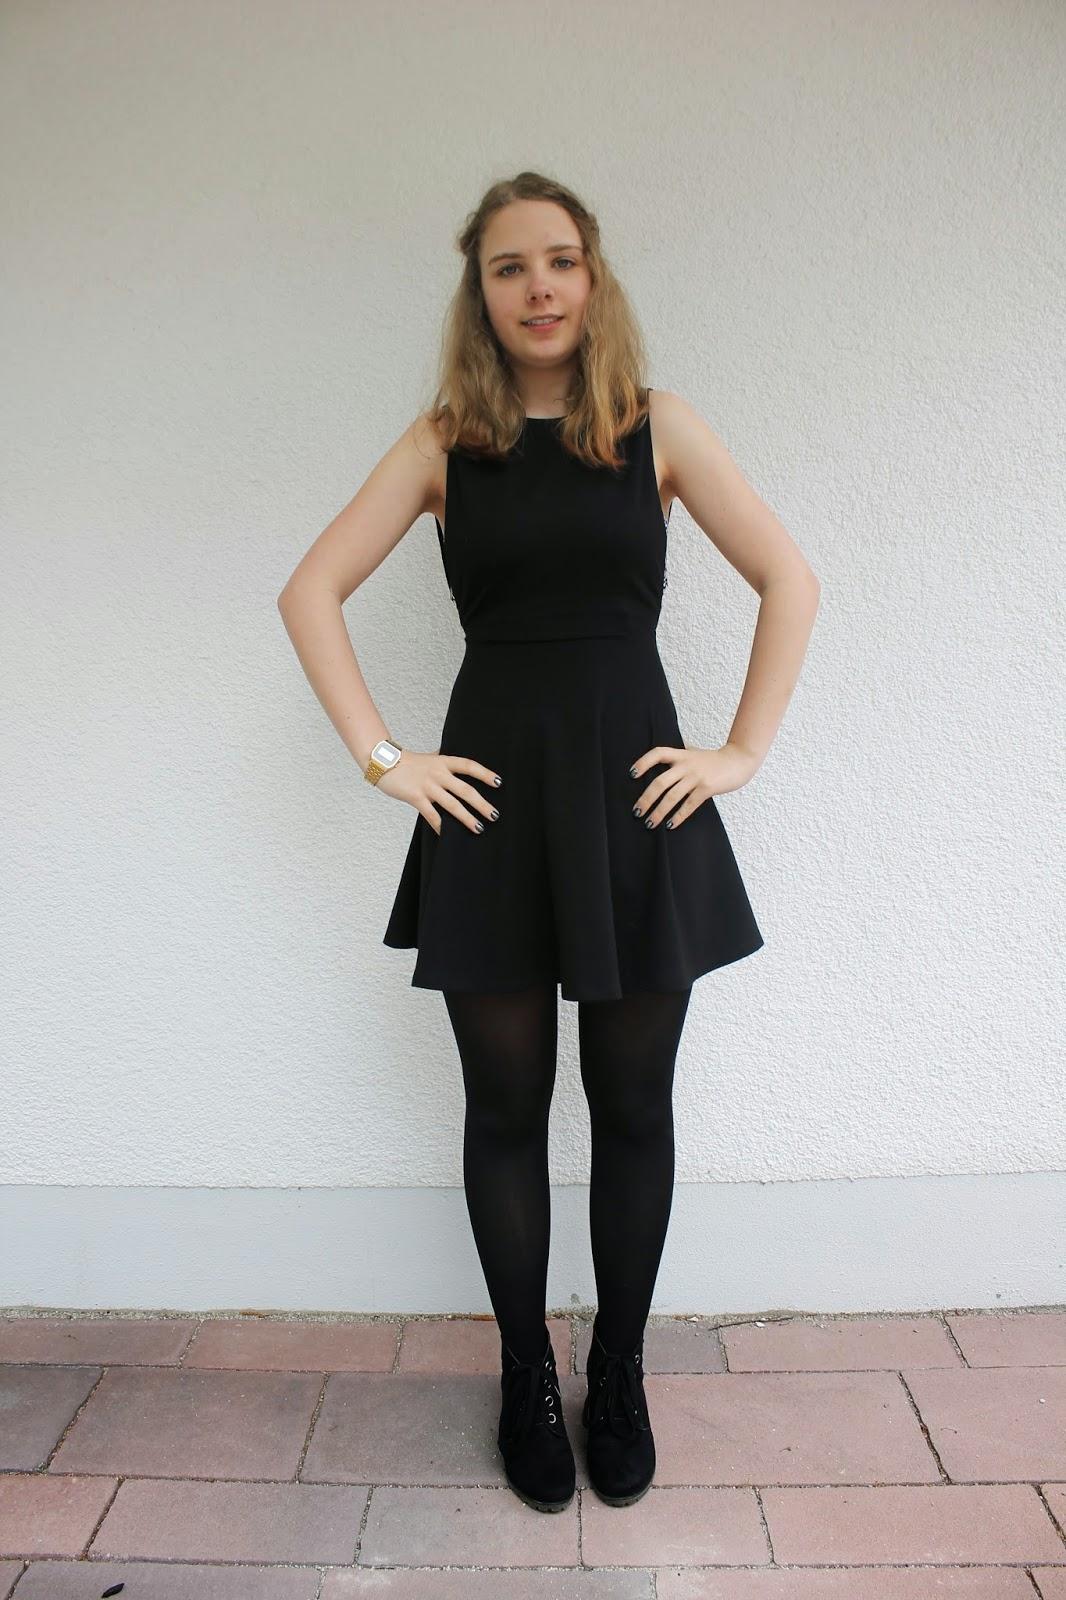 fairfashiontalk outfit schwarzes kleid. Black Bedroom Furniture Sets. Home Design Ideas